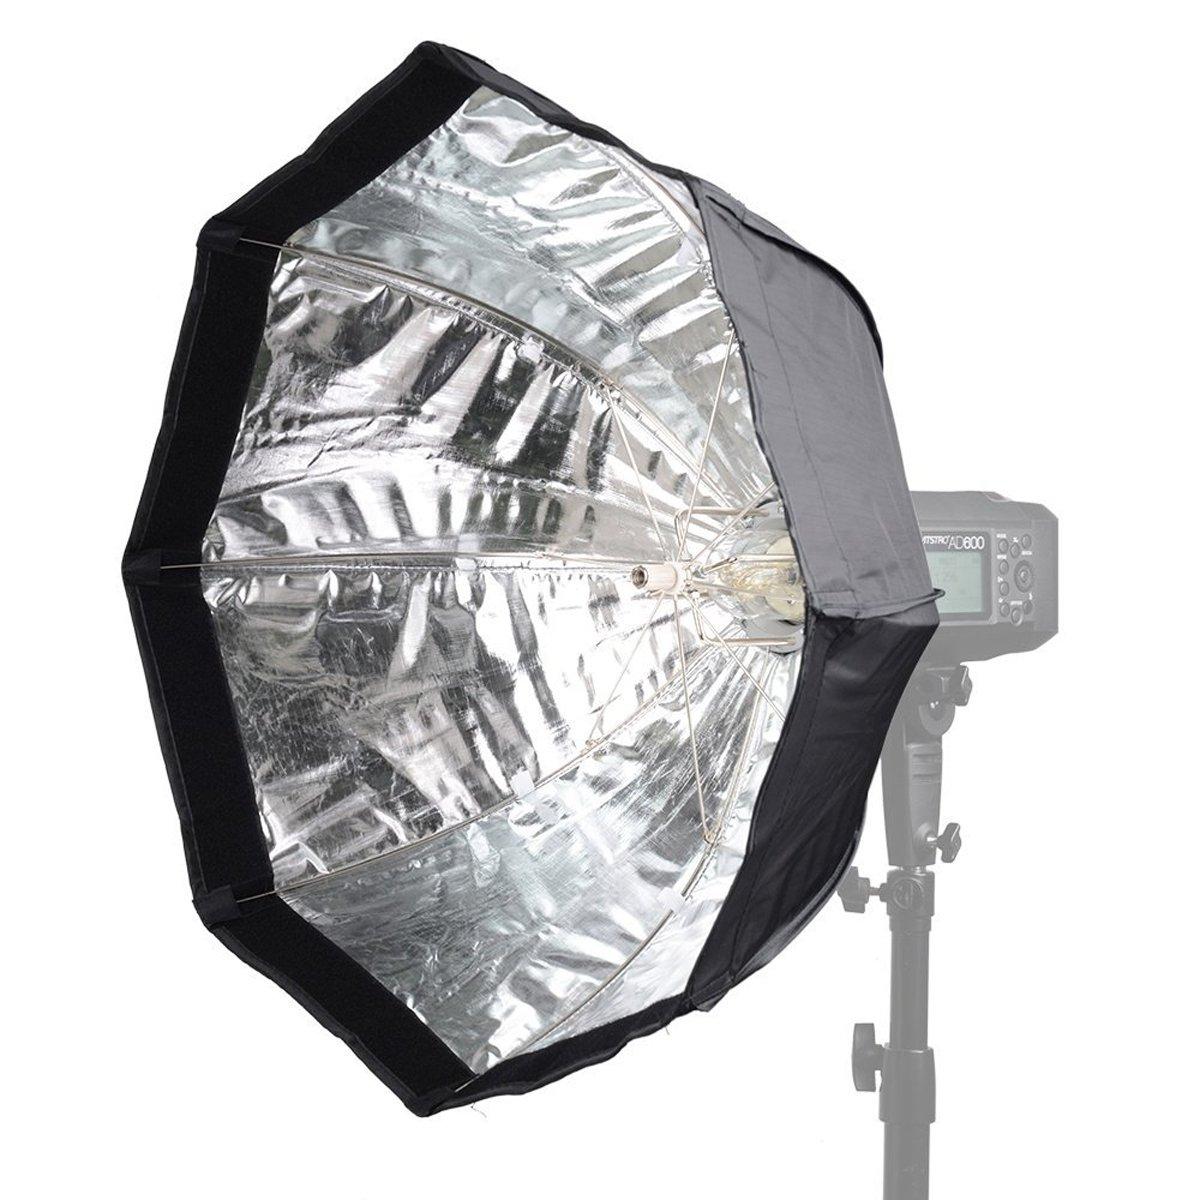 Amazon.com : Godox AD-H6 60cm Octagon Folding Umbrella Softbox For AD600 AD600M Flash (Godox Mount)  : Camera & Photo